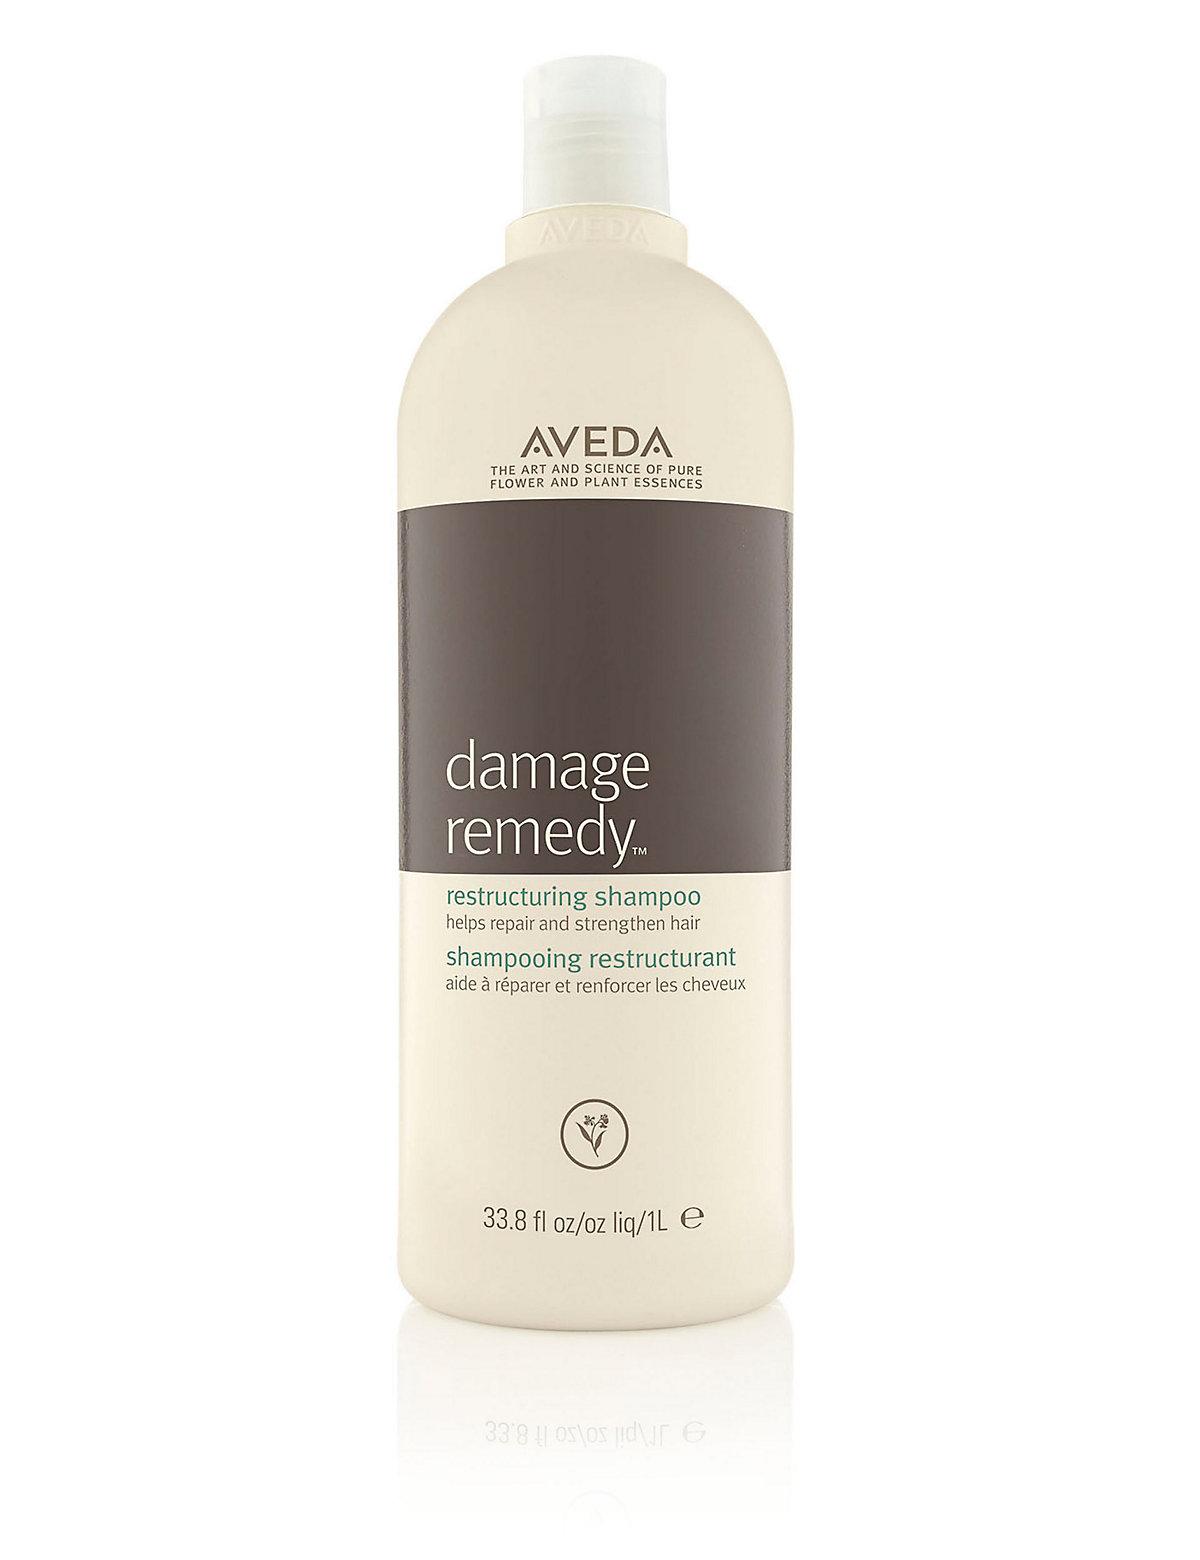 AVEDA 1 Litre Restructuring Shampoo - *Save 25% per ml